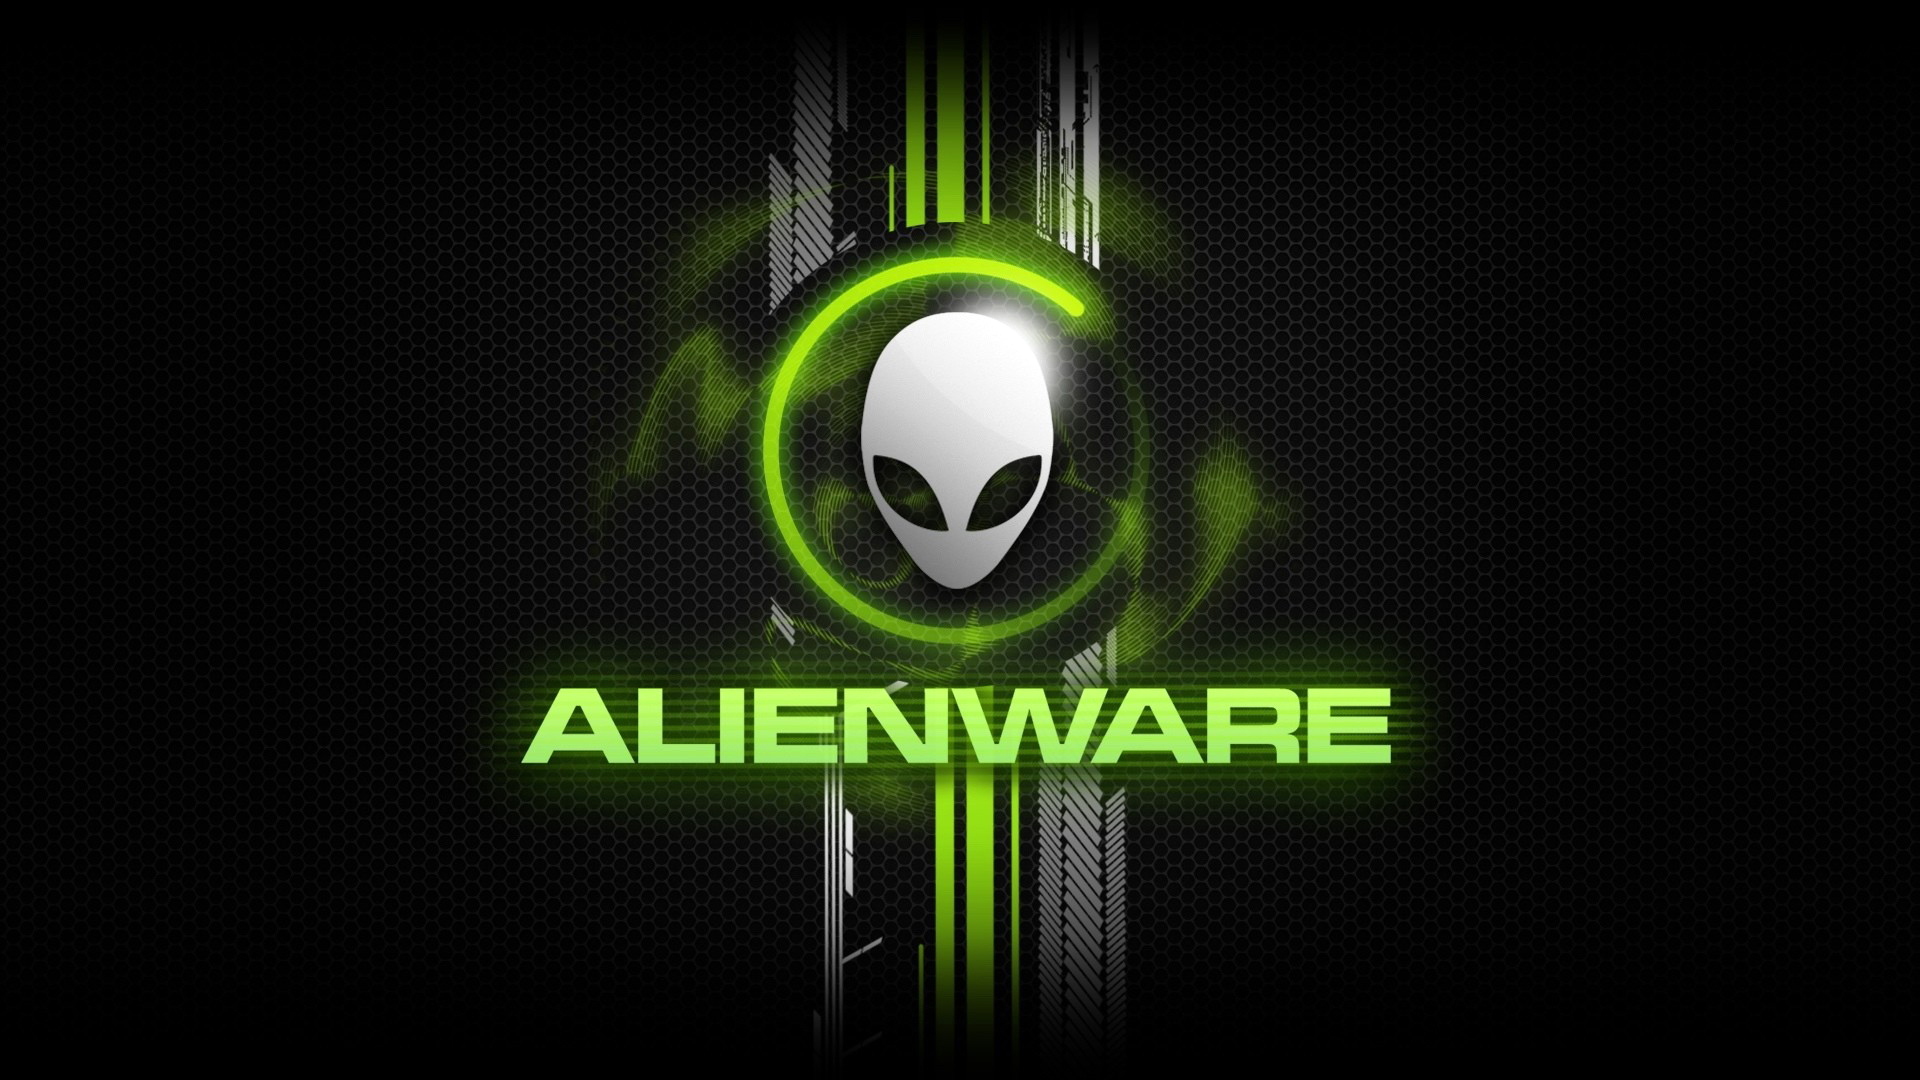 alienware logo hd 1920x1080 1080p wallpaper compatible for 1280x720 1920x1080